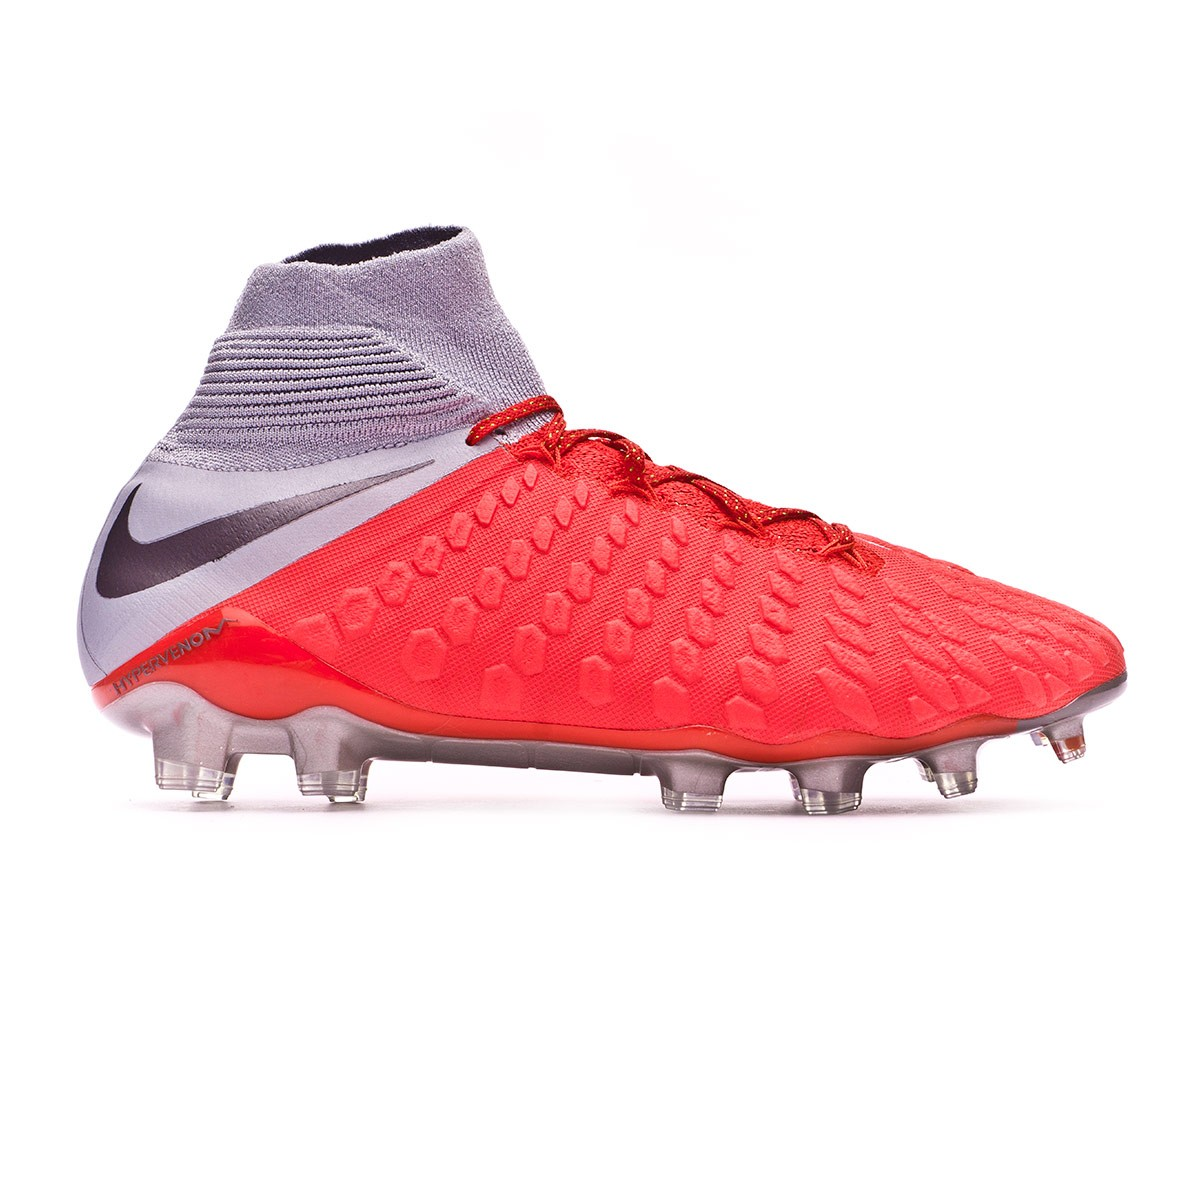 f3dab164bc1 Football Boots Nike Hypervenom Phantom III Elite DF FG Light crimson-Metallic  dark grey-Wolf grey - Tienda de fútbol Fútbol Emotion